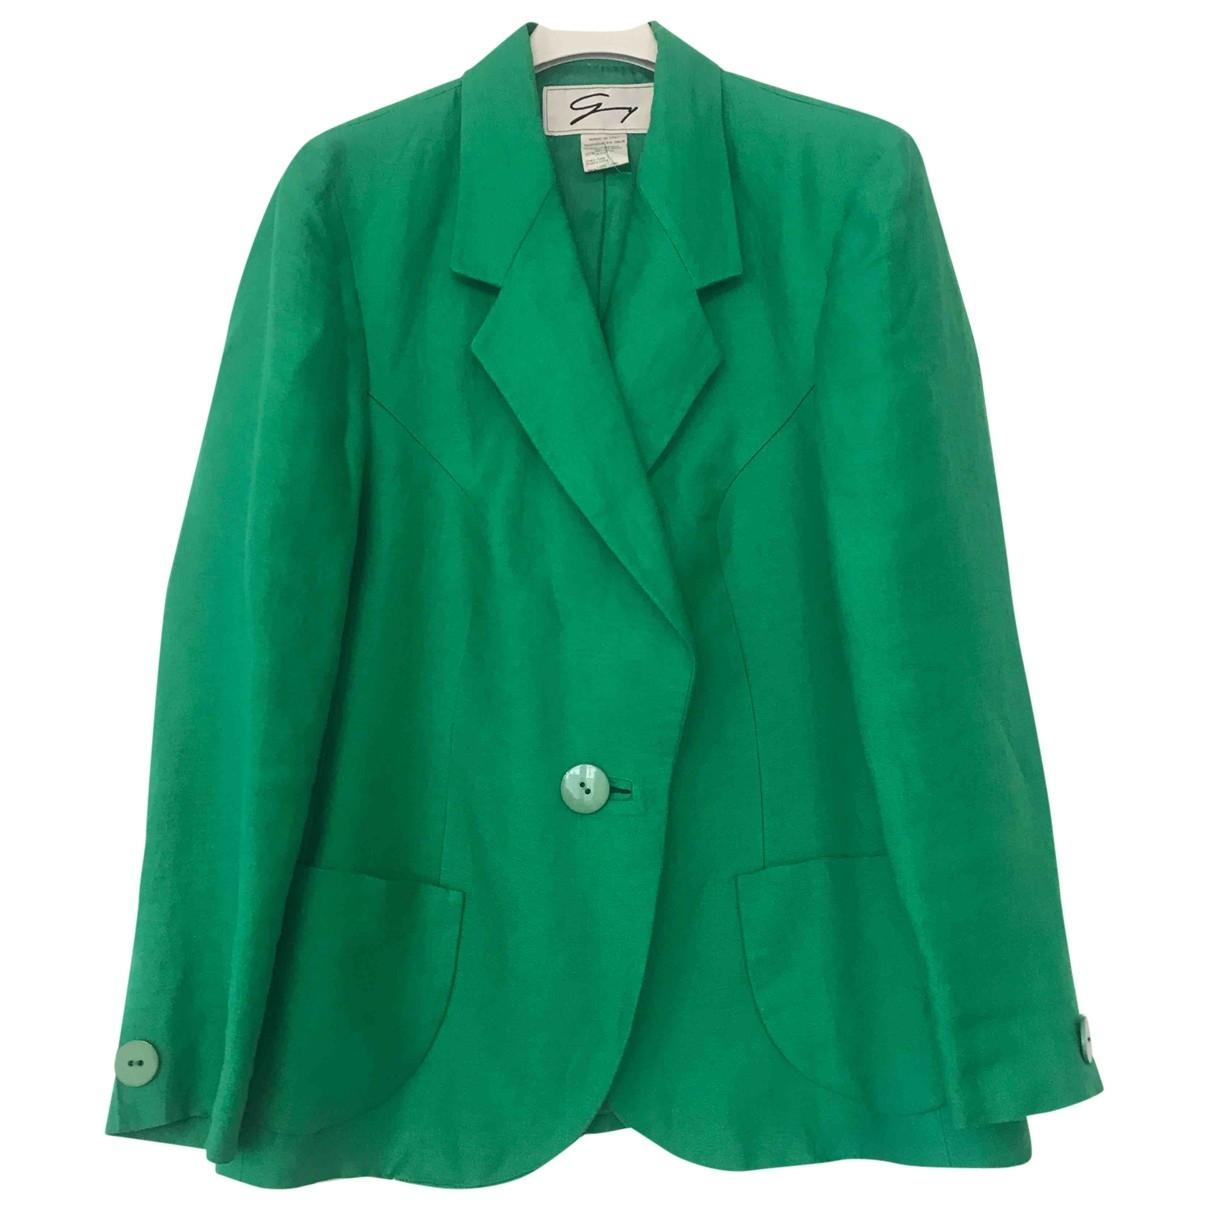 Genny - Veste   pour femme en lin - vert